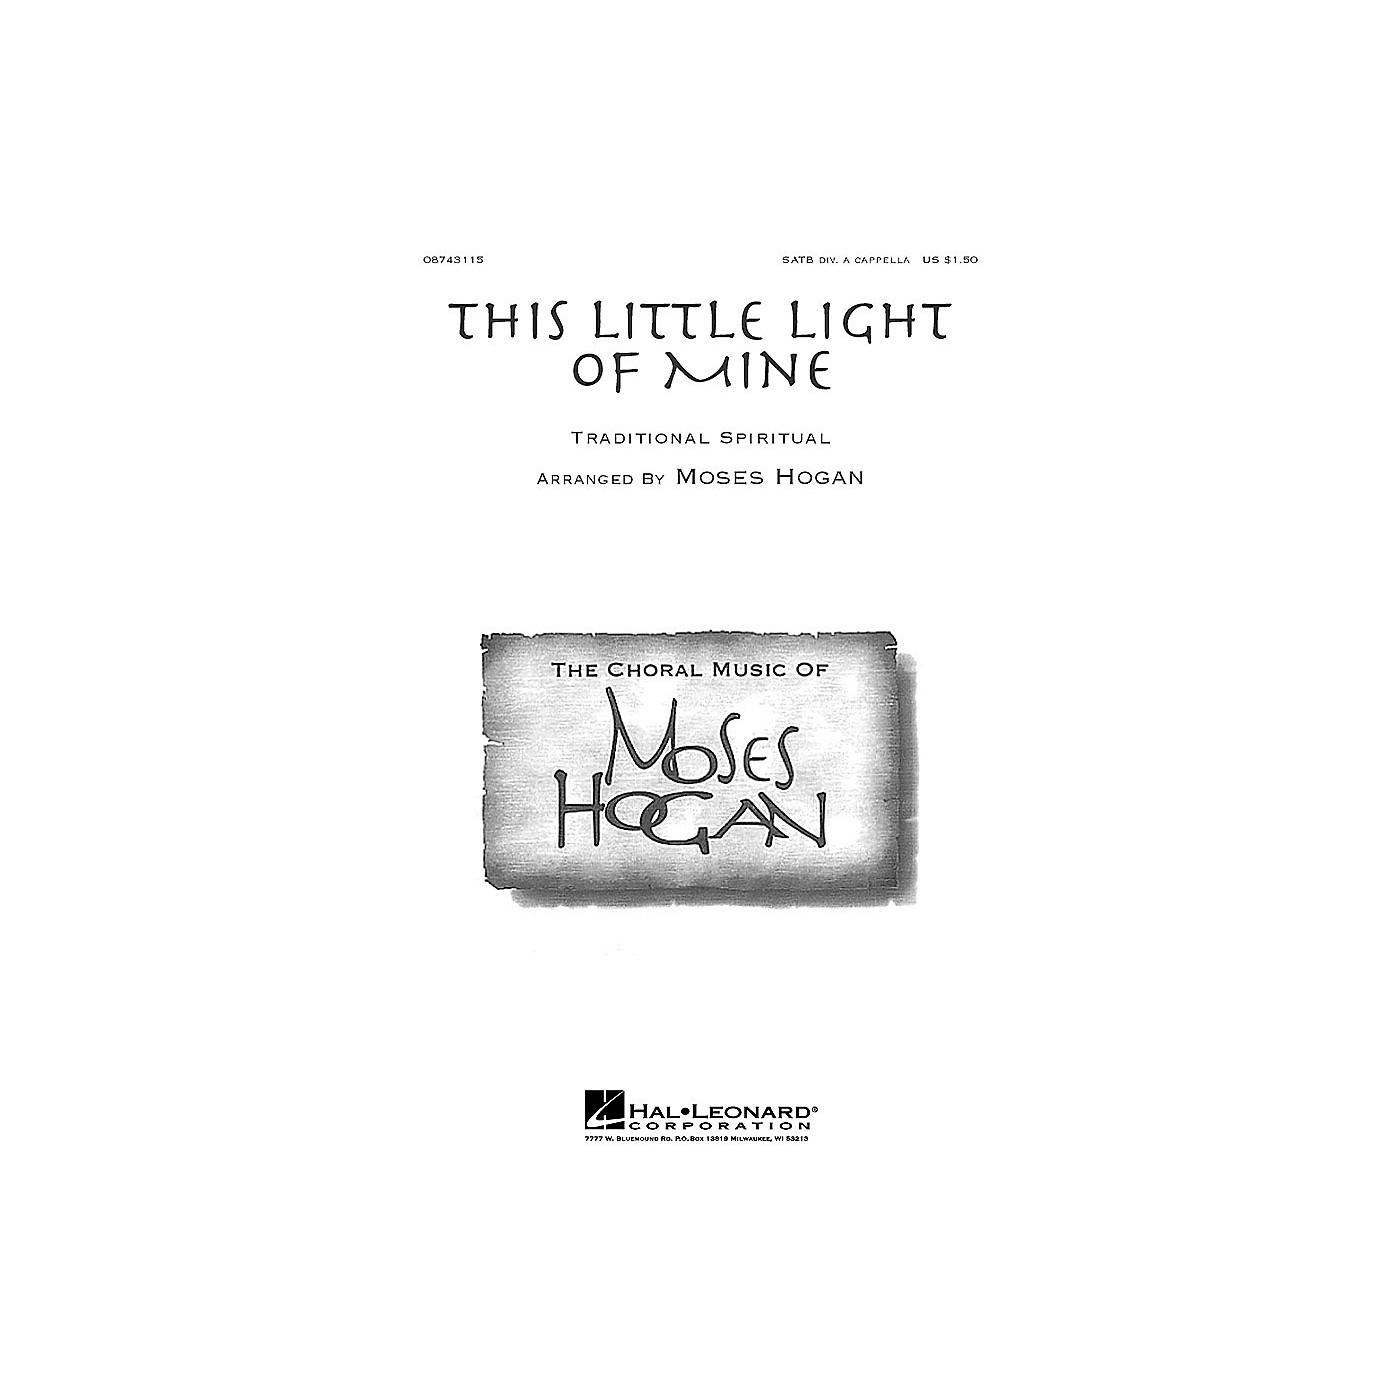 Hal Leonard This Little Light of Mine (SATB div.) SATB DV A Cappella arranged by Moses Hogan thumbnail